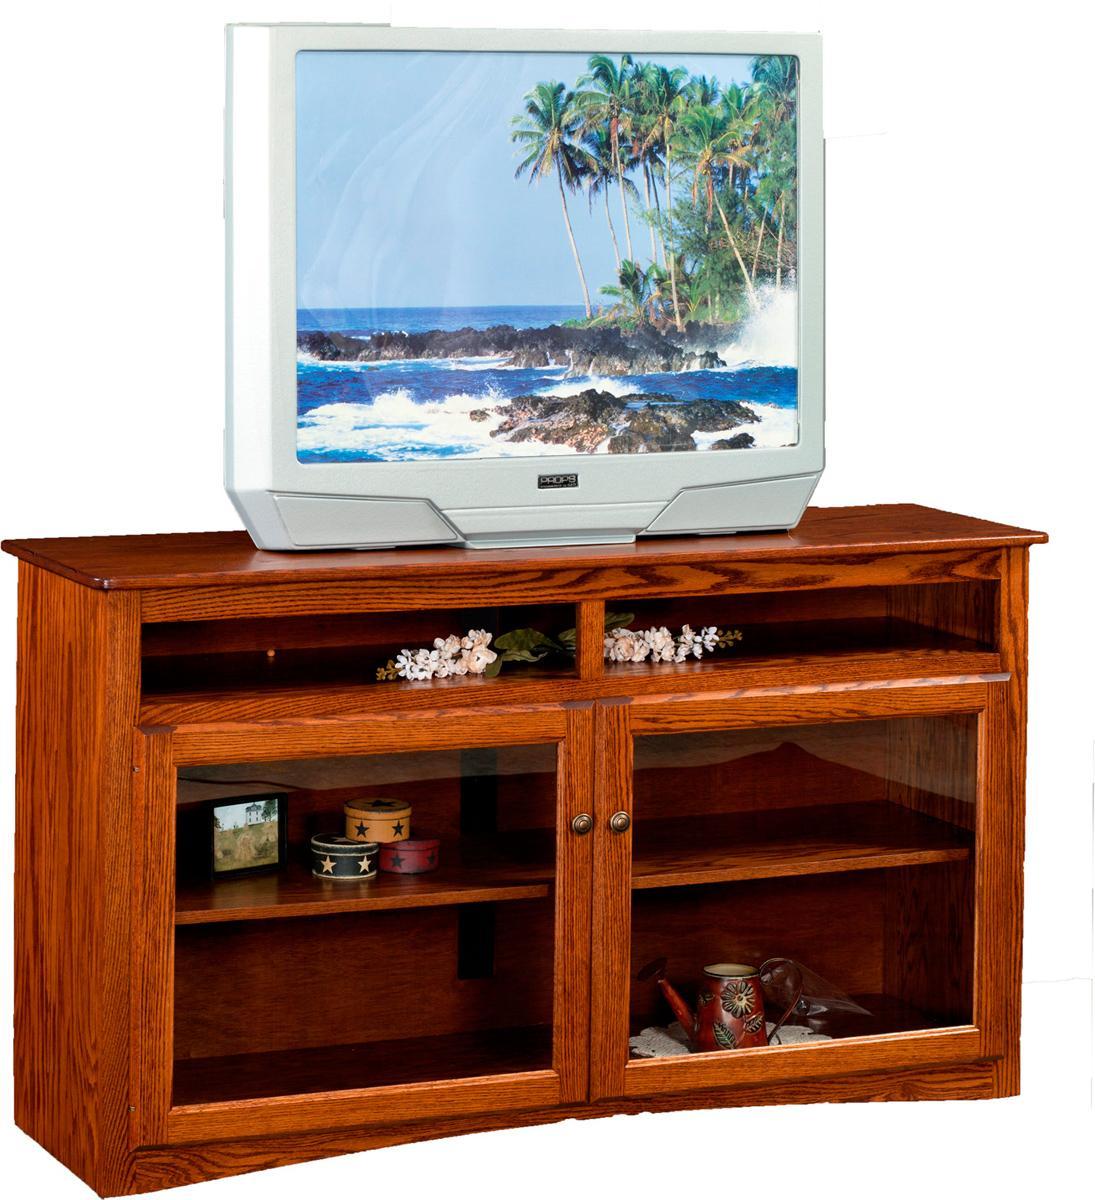 Economy TV Stand - wide